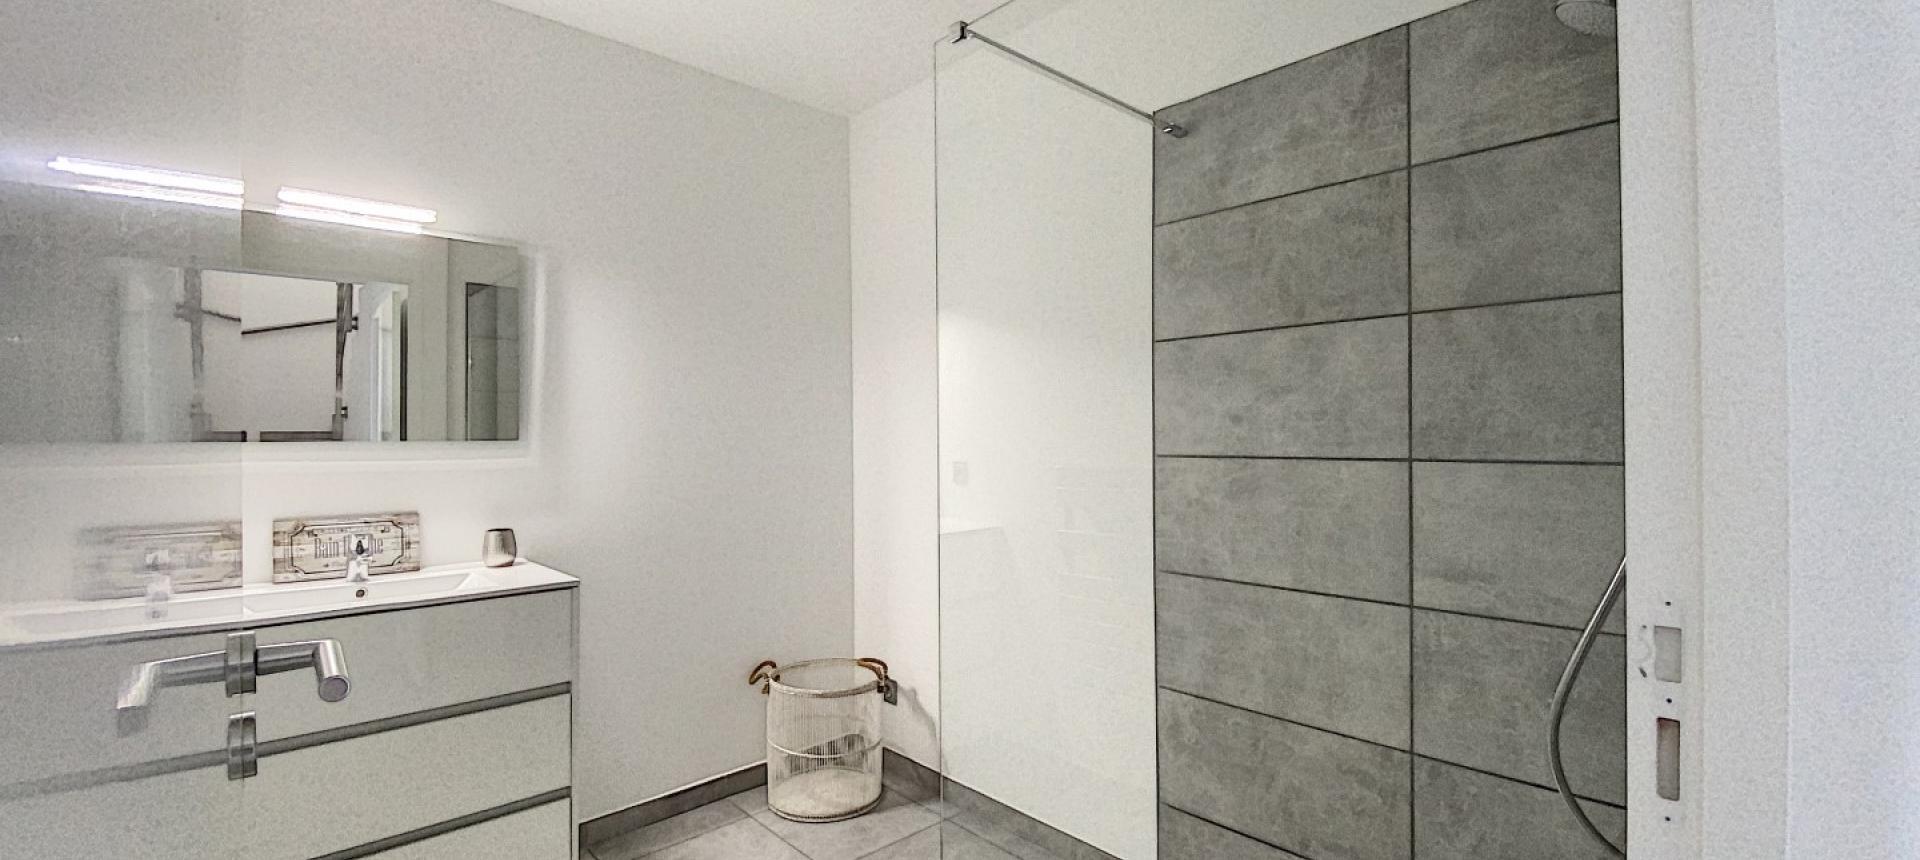 T3 Duplex Stagnola salle de bain